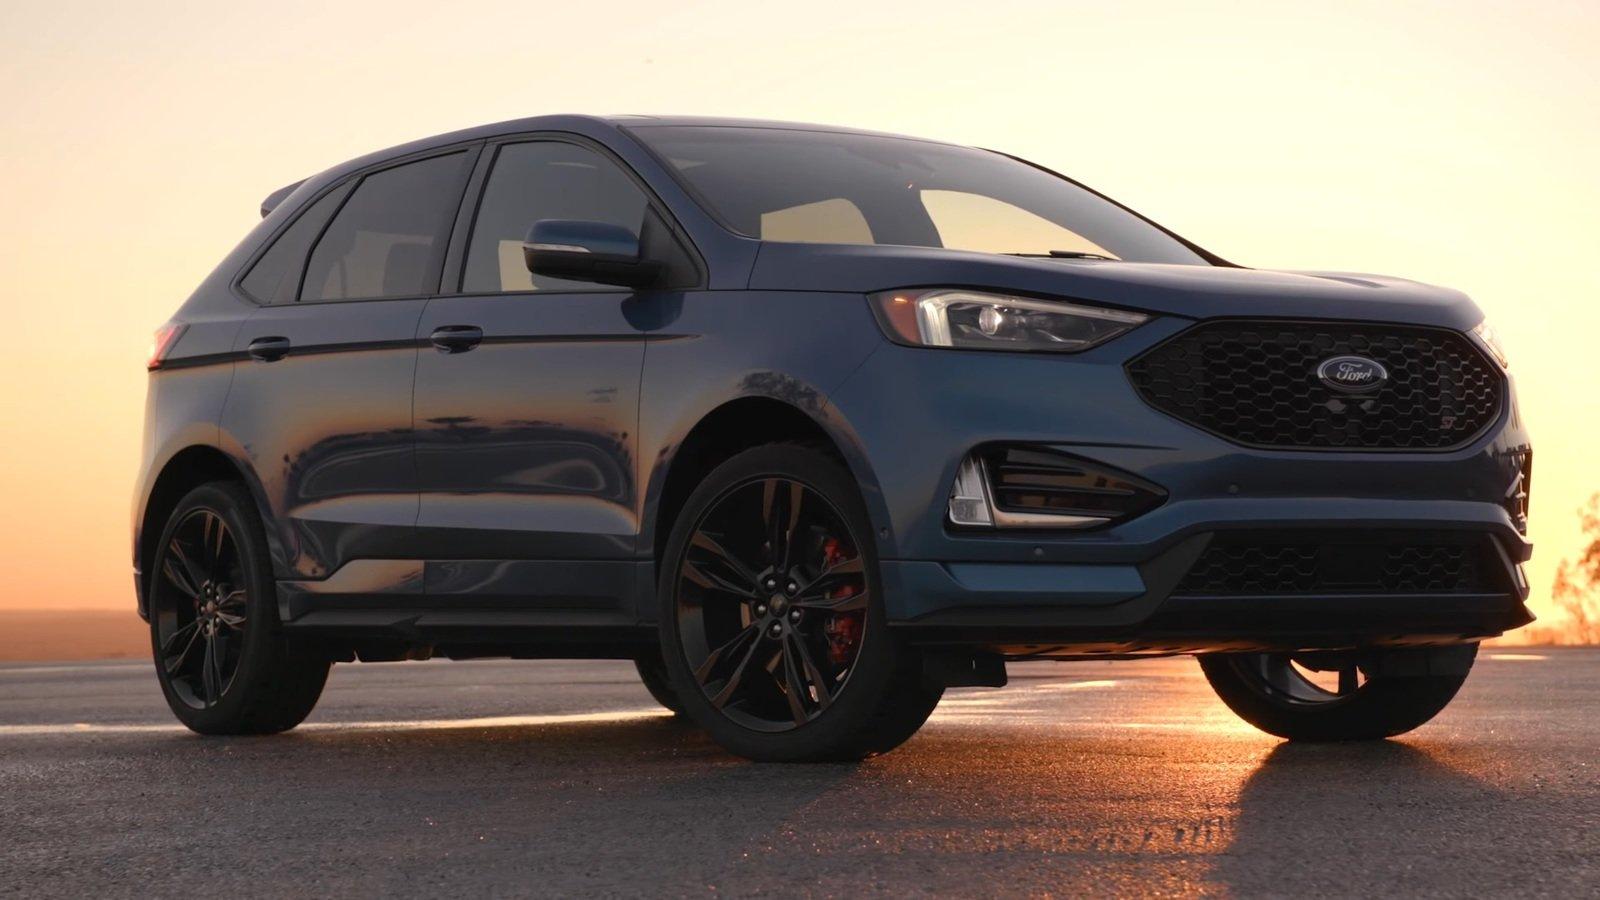 ford edge price release date specs interior design review